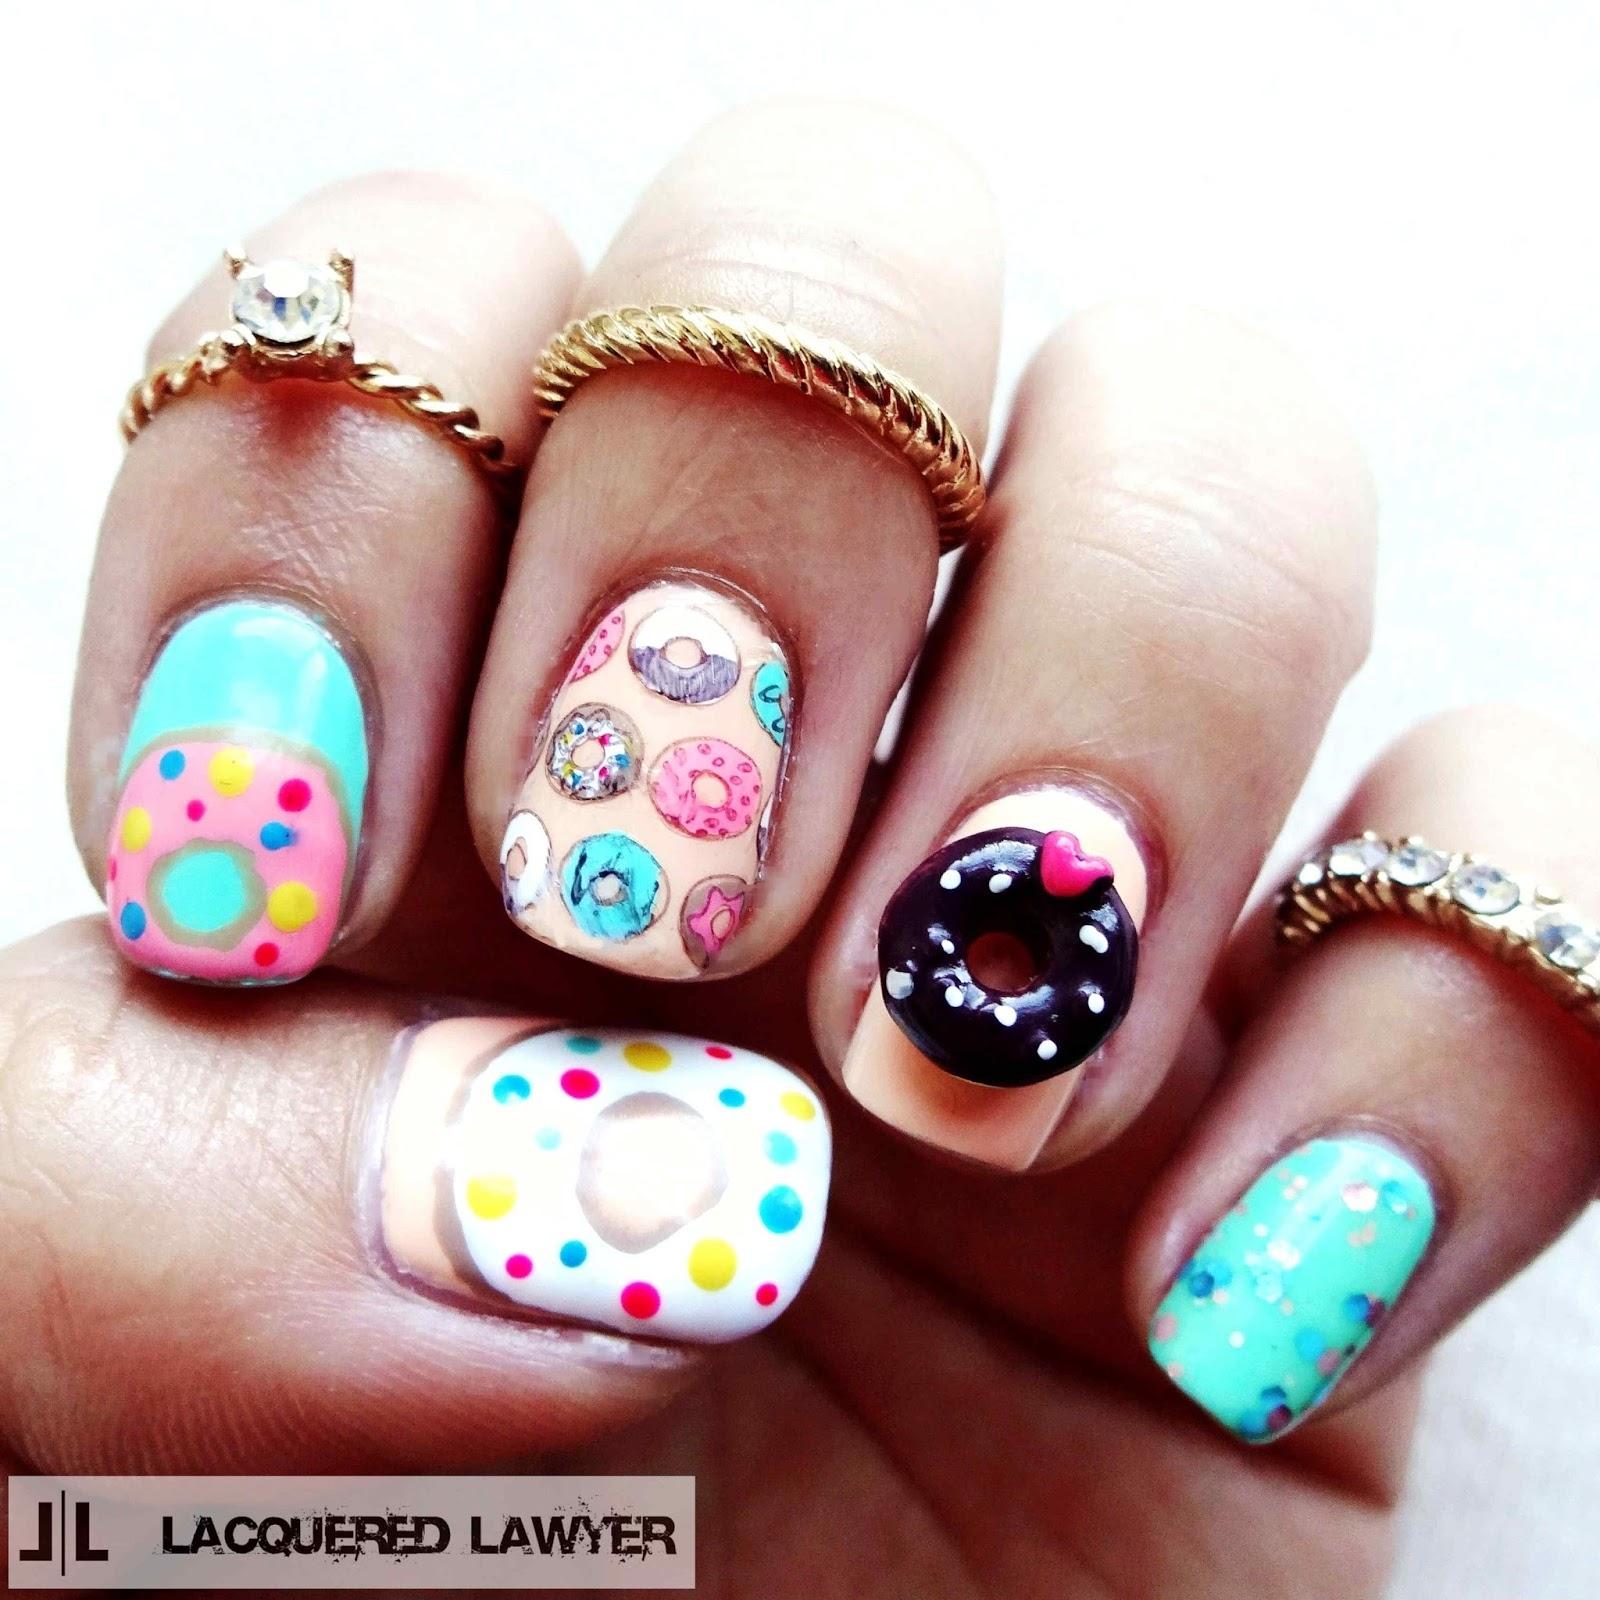 jewels-candy